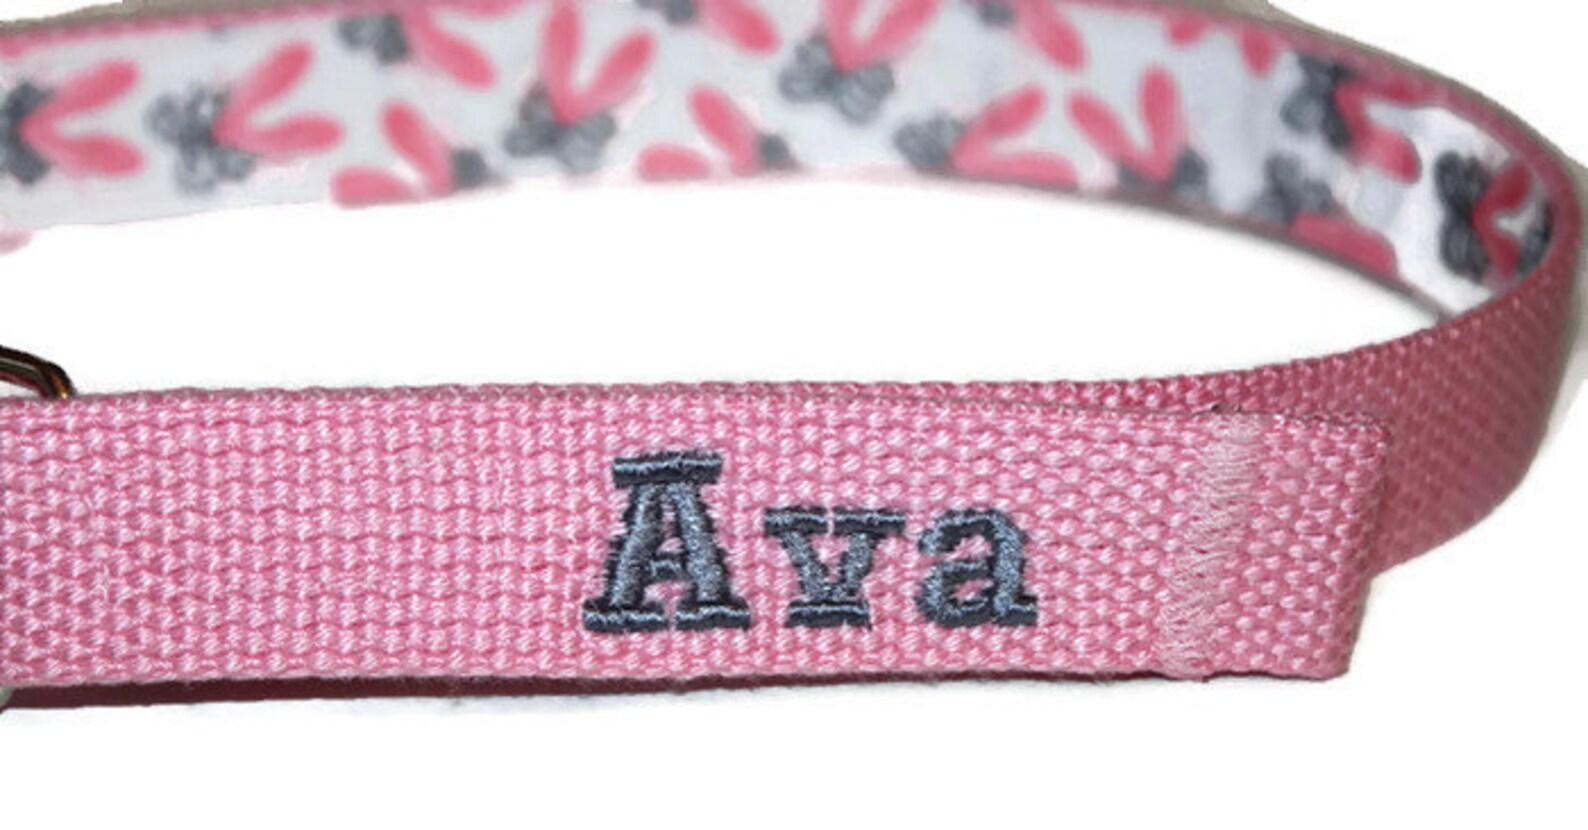 girls first belt pink easy off belt for girls. monogram belt name belt ballet belt preschool belt plus size belt girls self clos